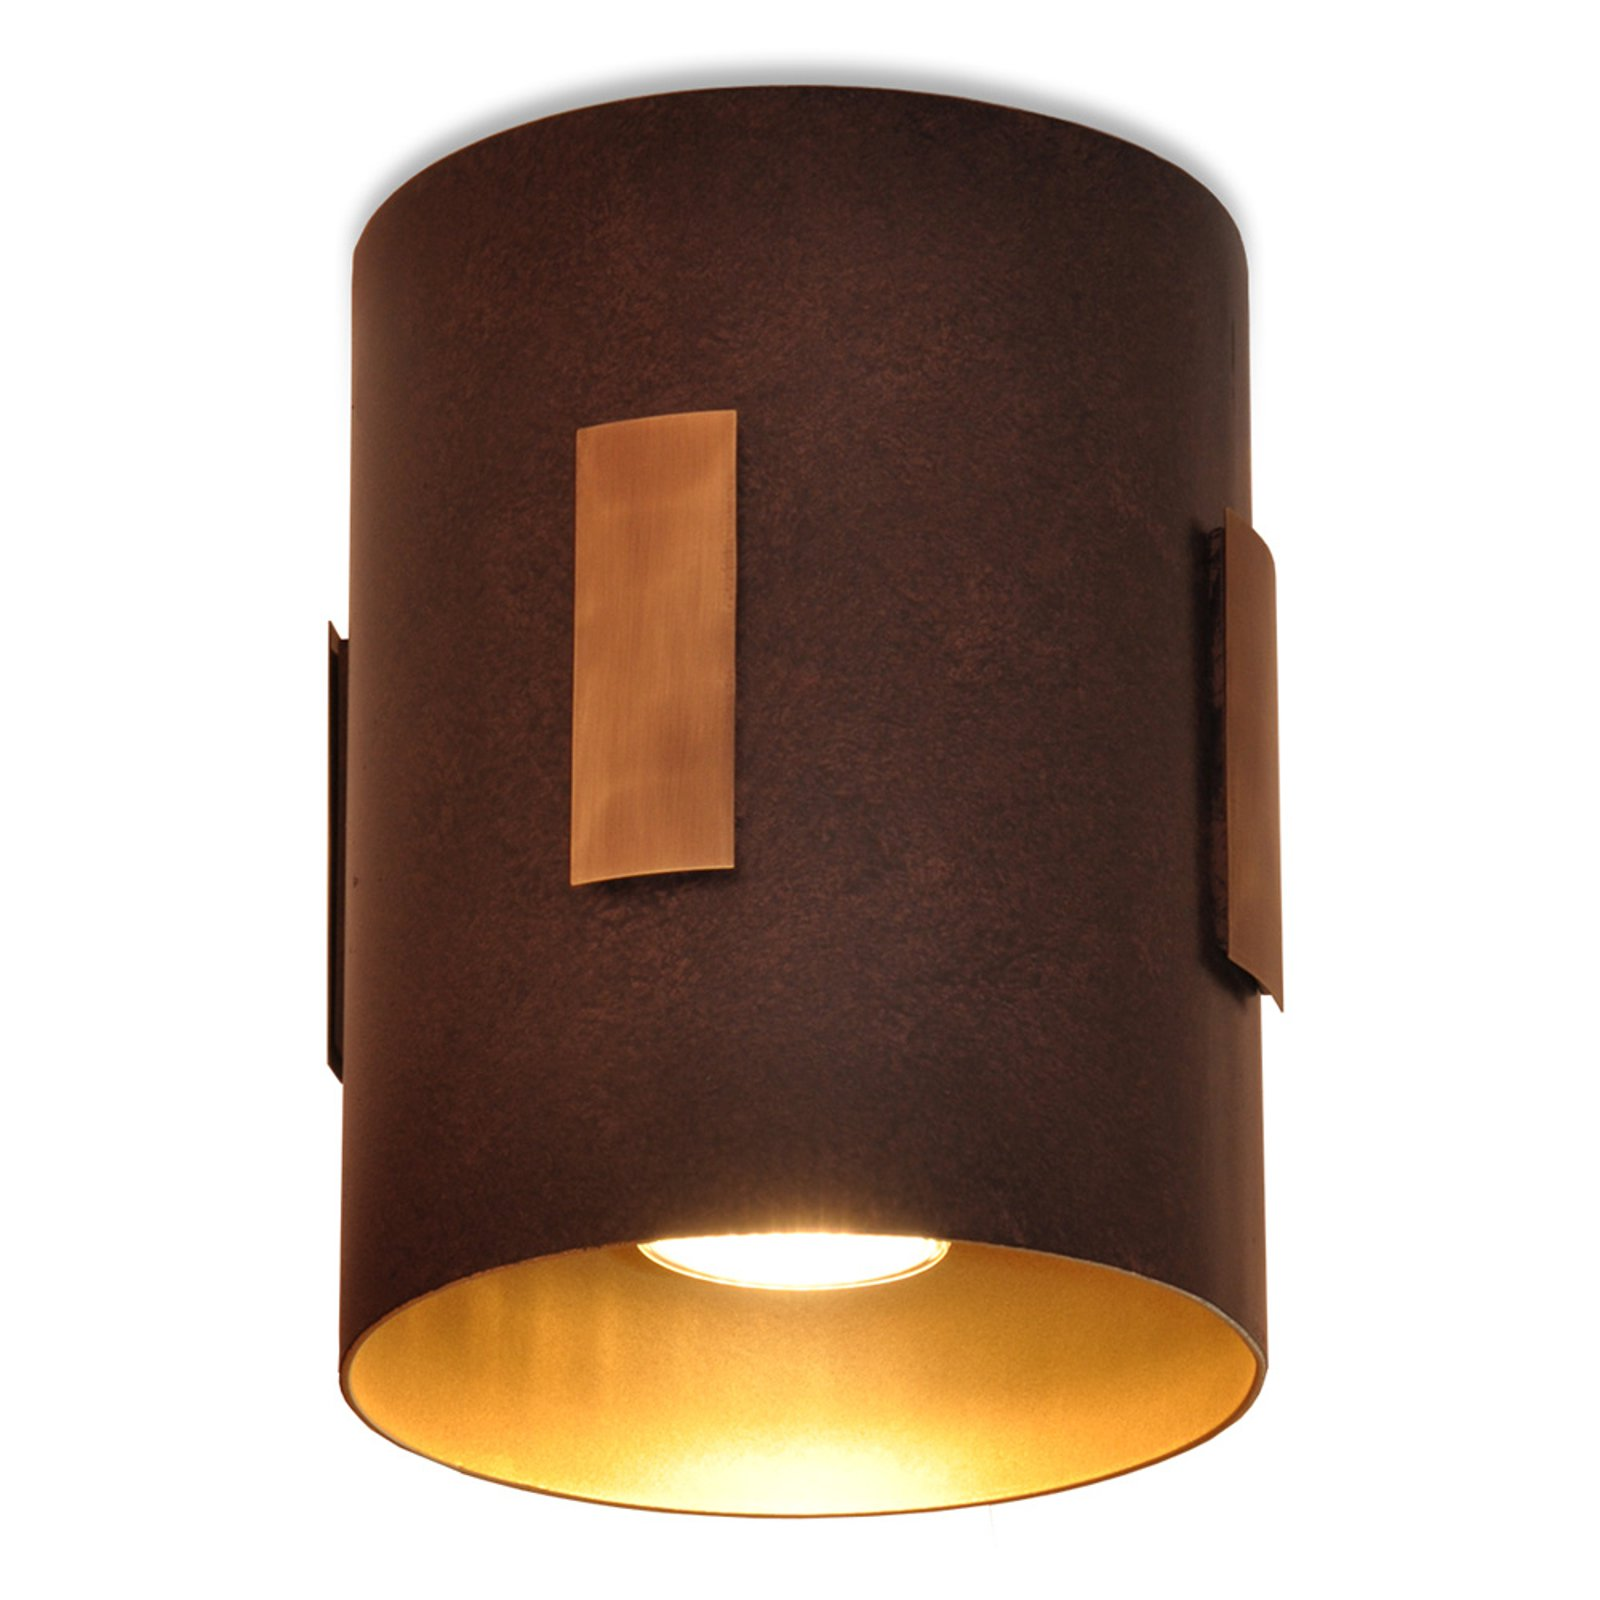 Menzel Solo taklampe brun/svart/gull